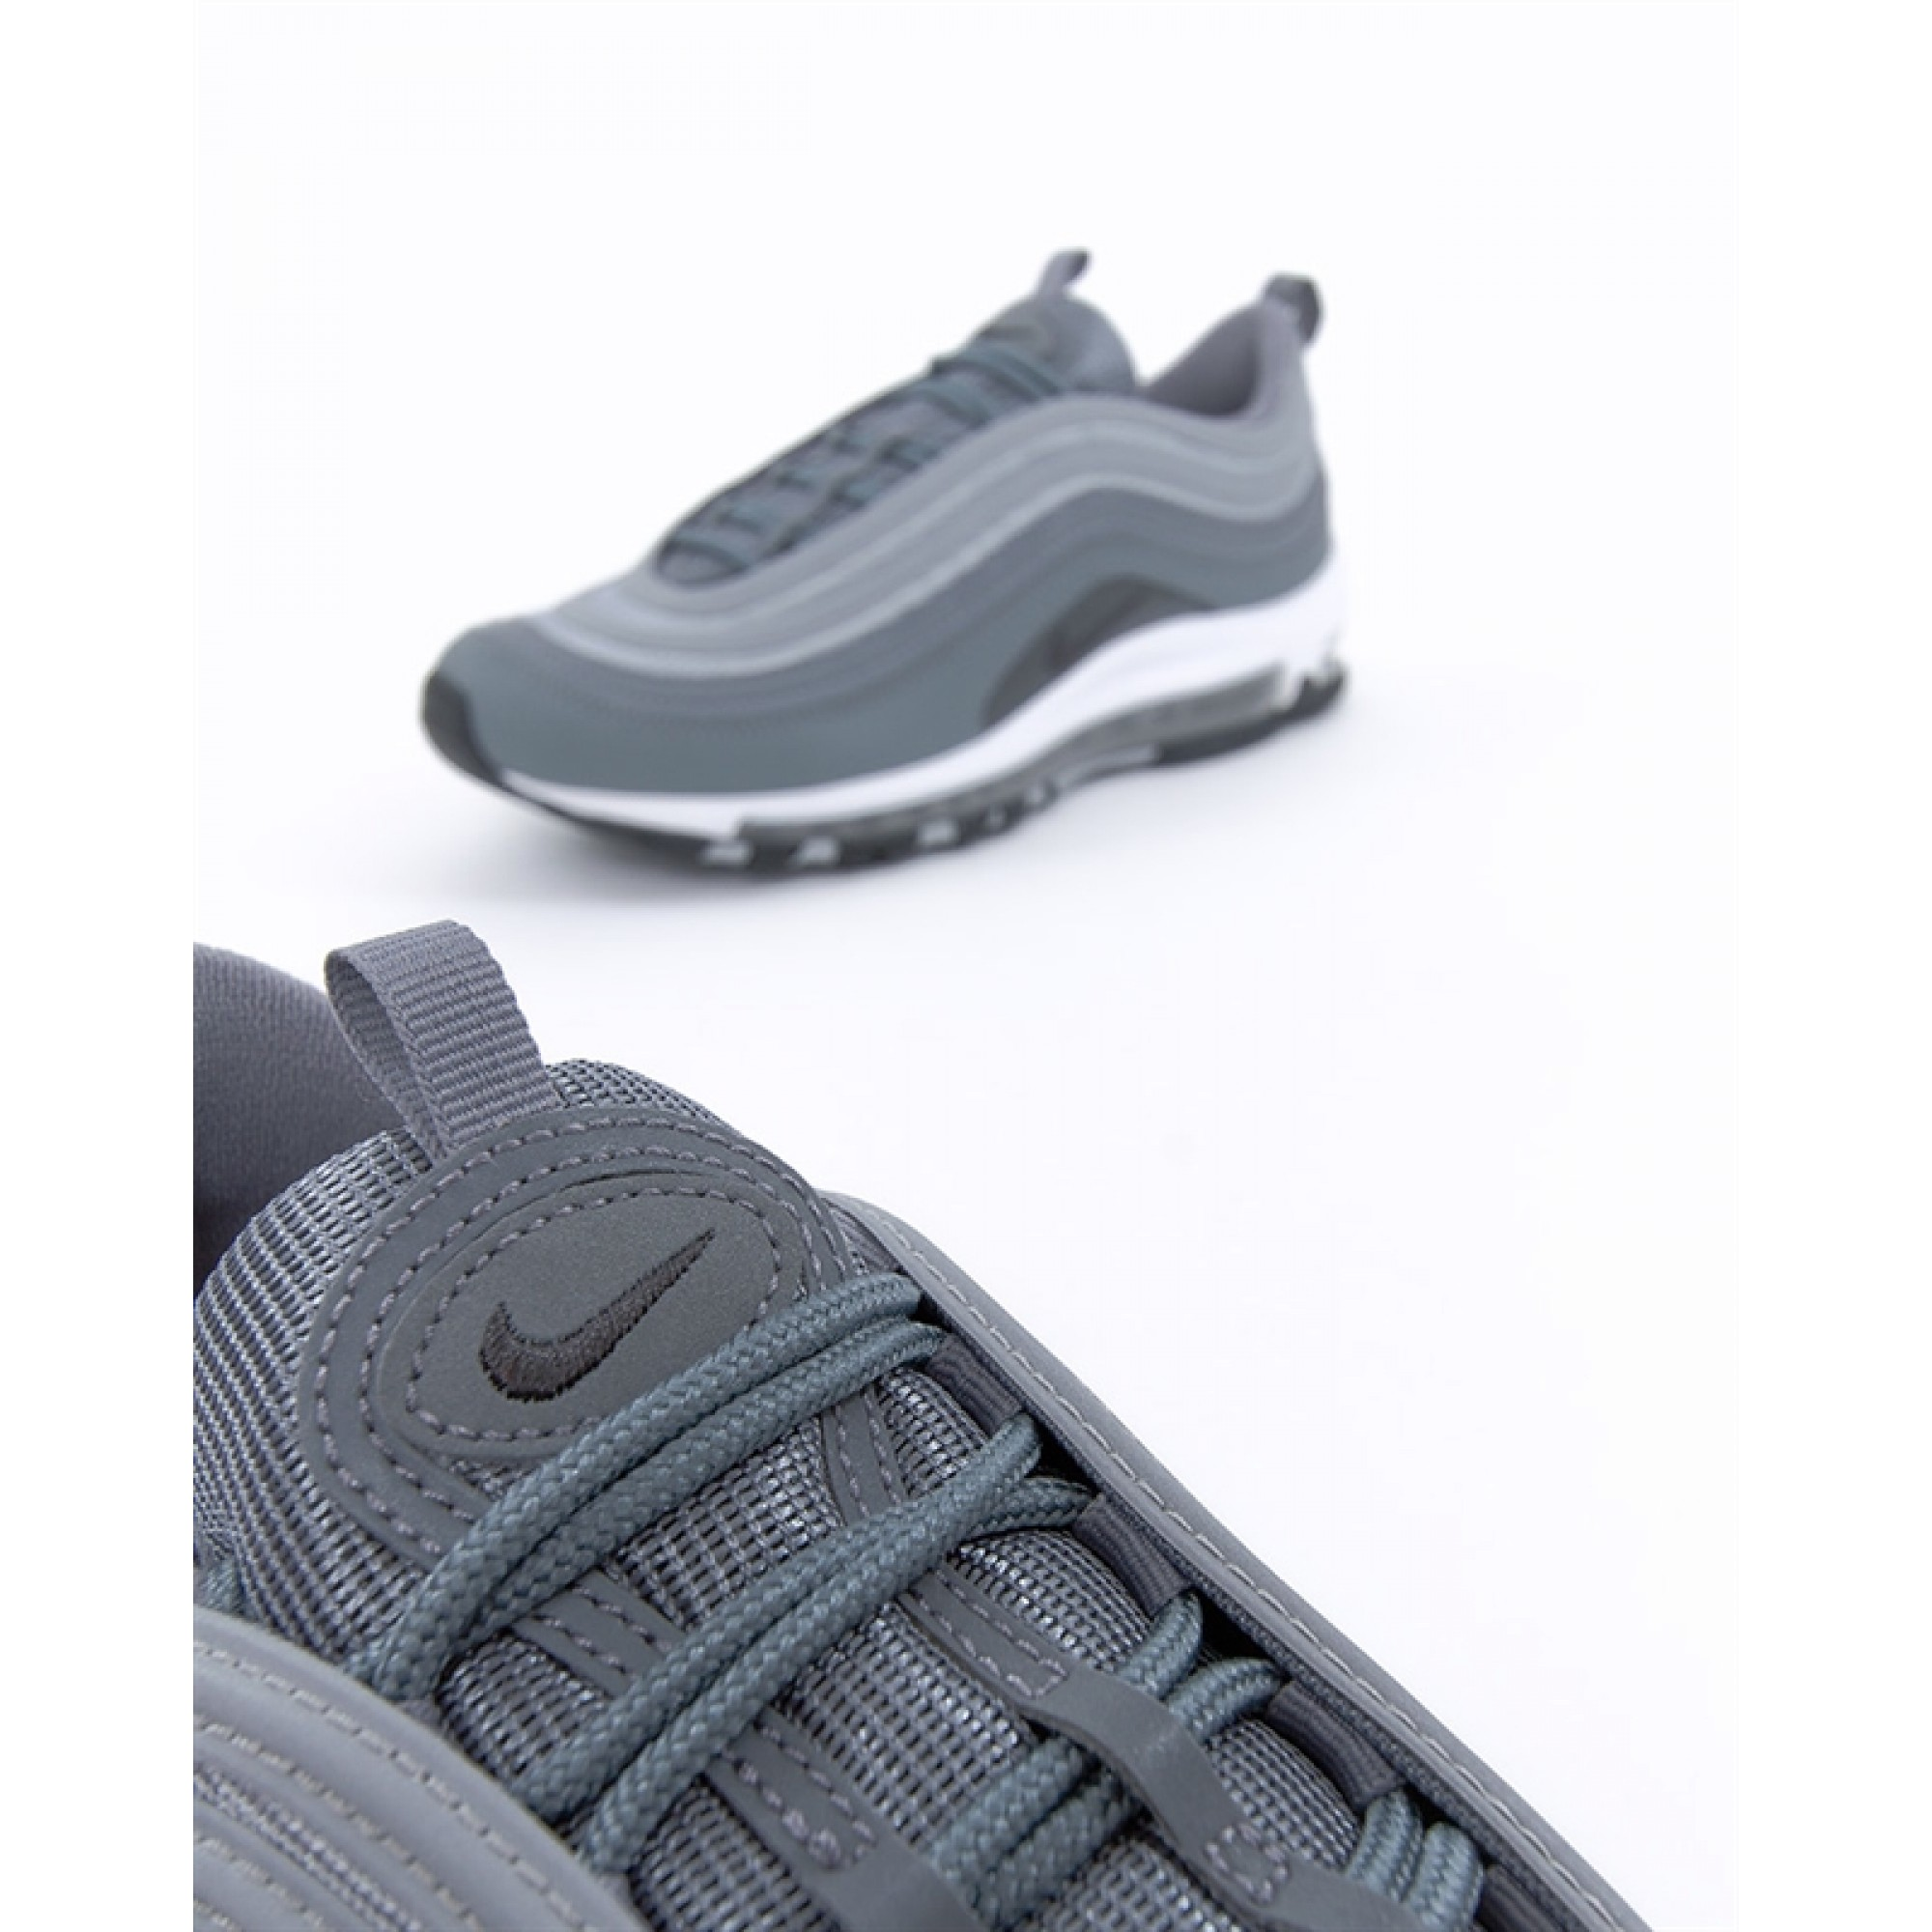 c59a8297766 Men's Nike Air Max 97 ''Grey''   BV1986-001 Ανδρικό Παπούτσι